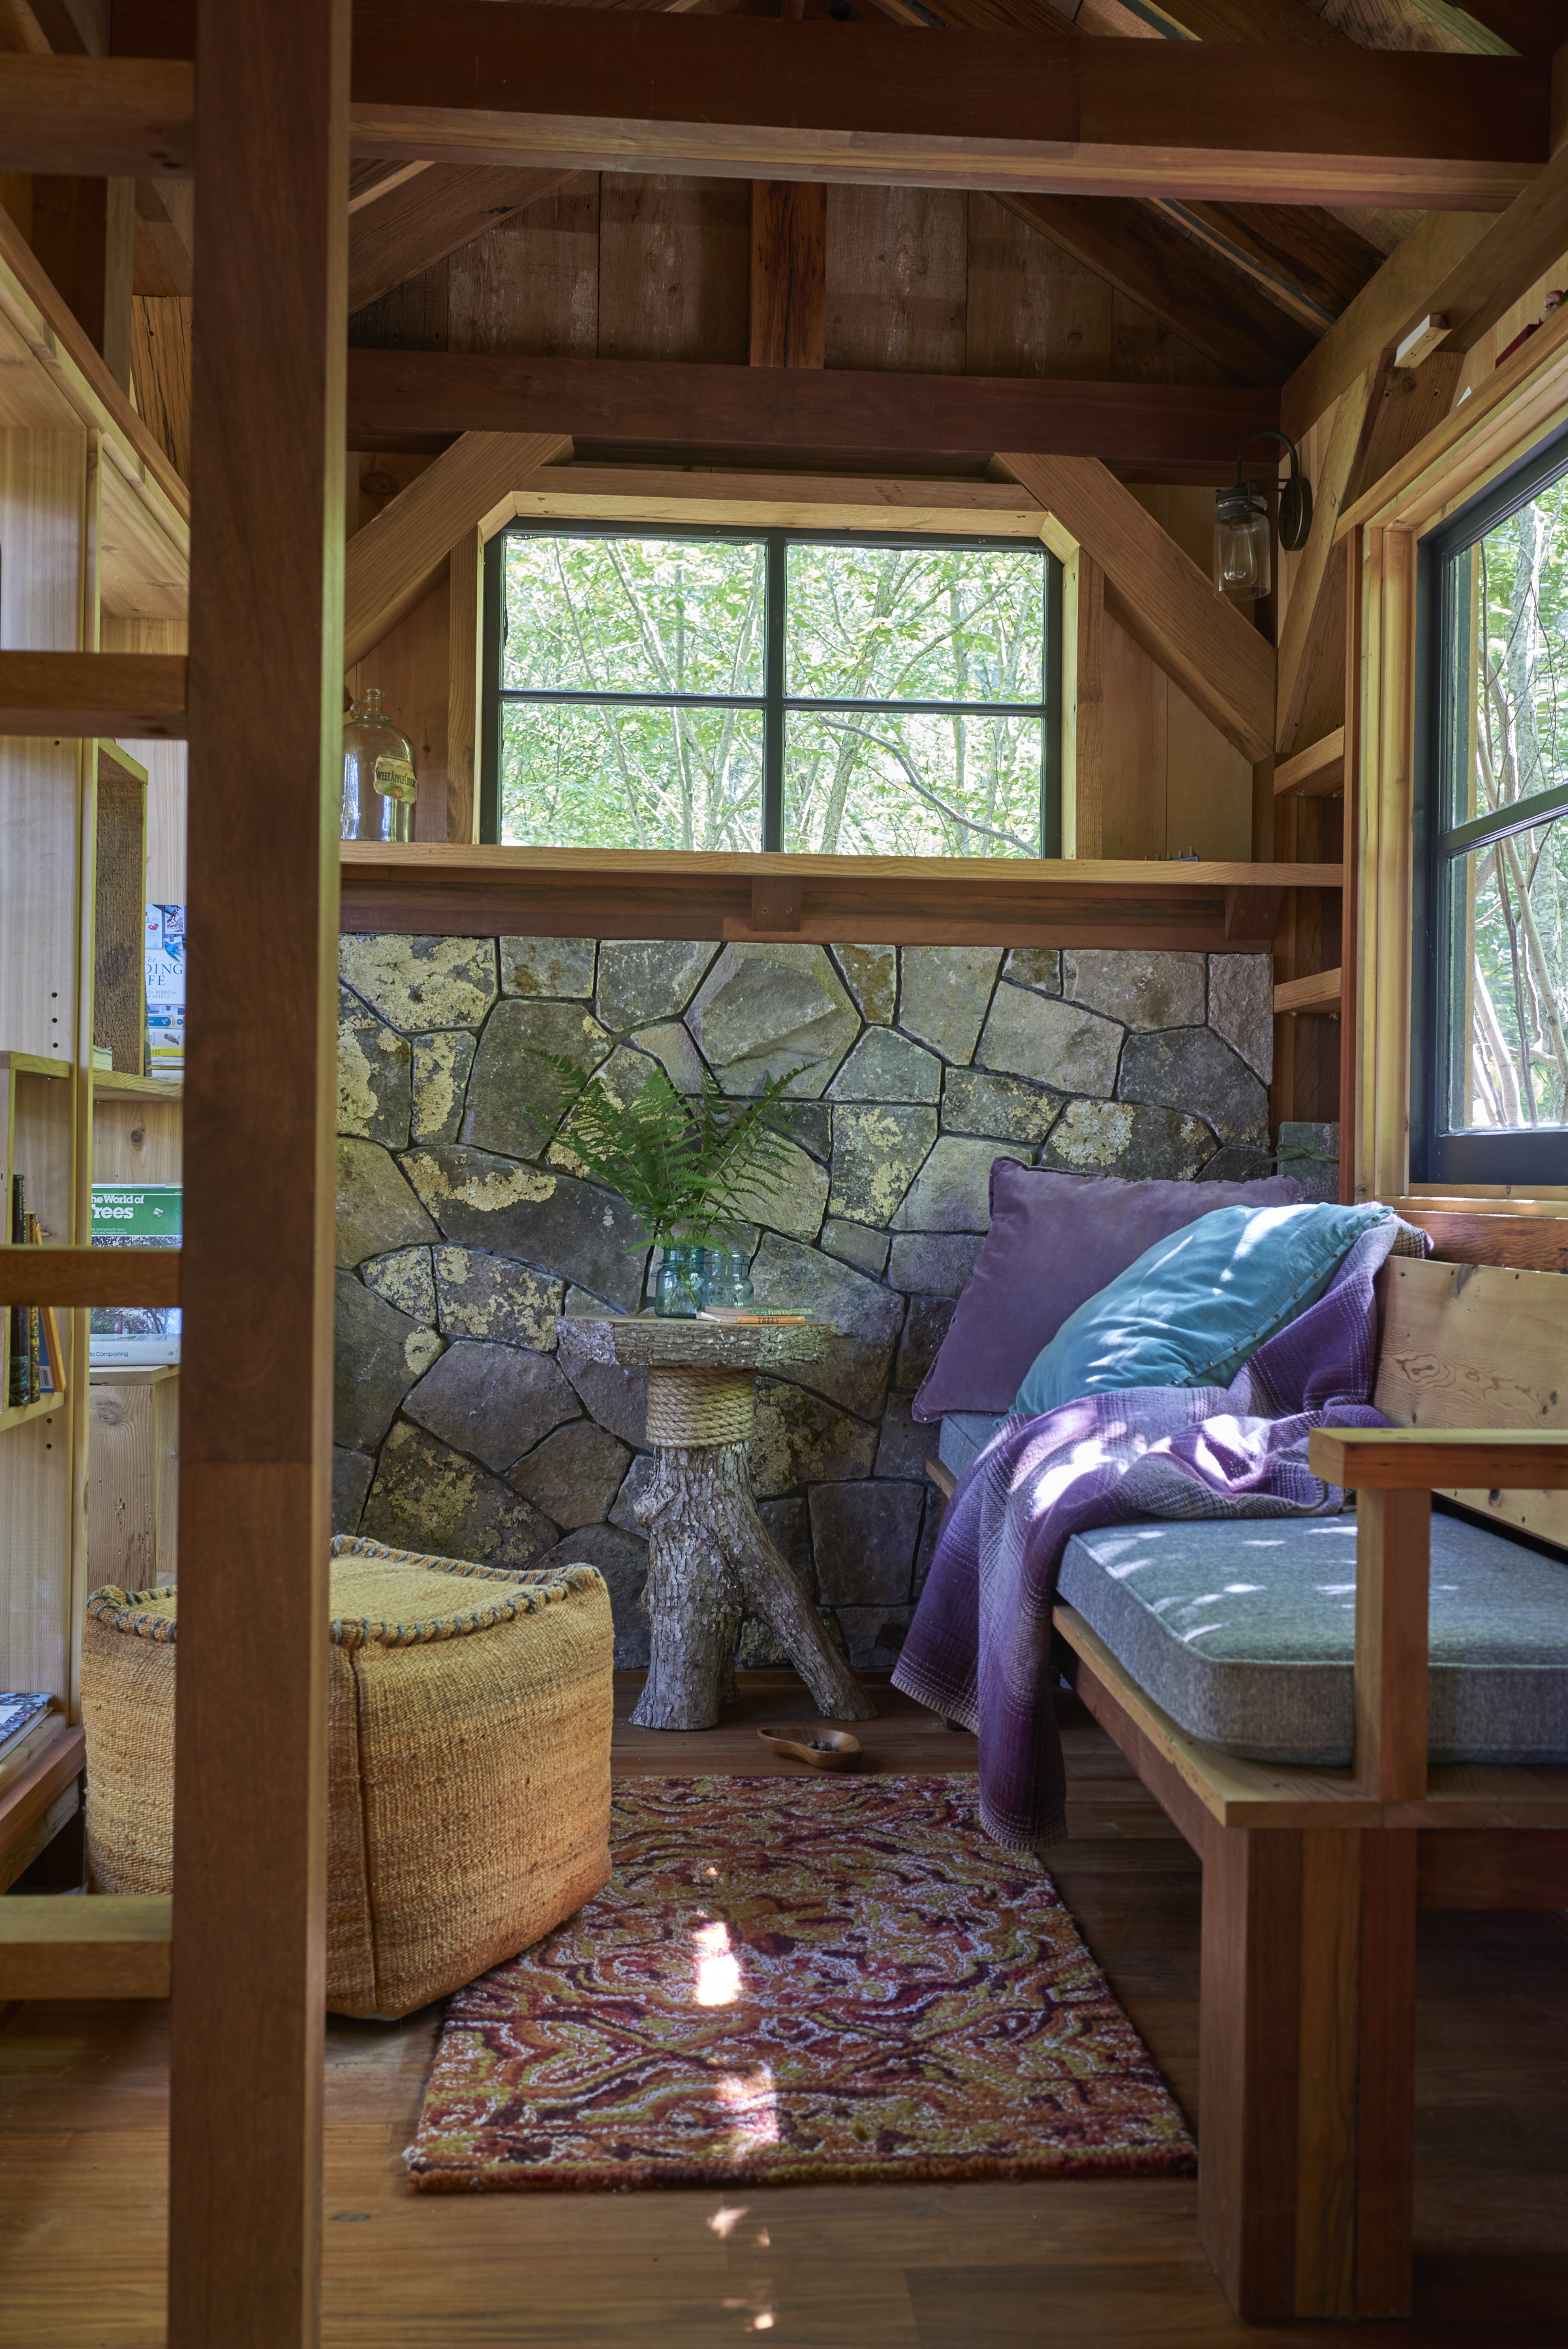 Davis.treehouse.9.8.1712252 1.jpg